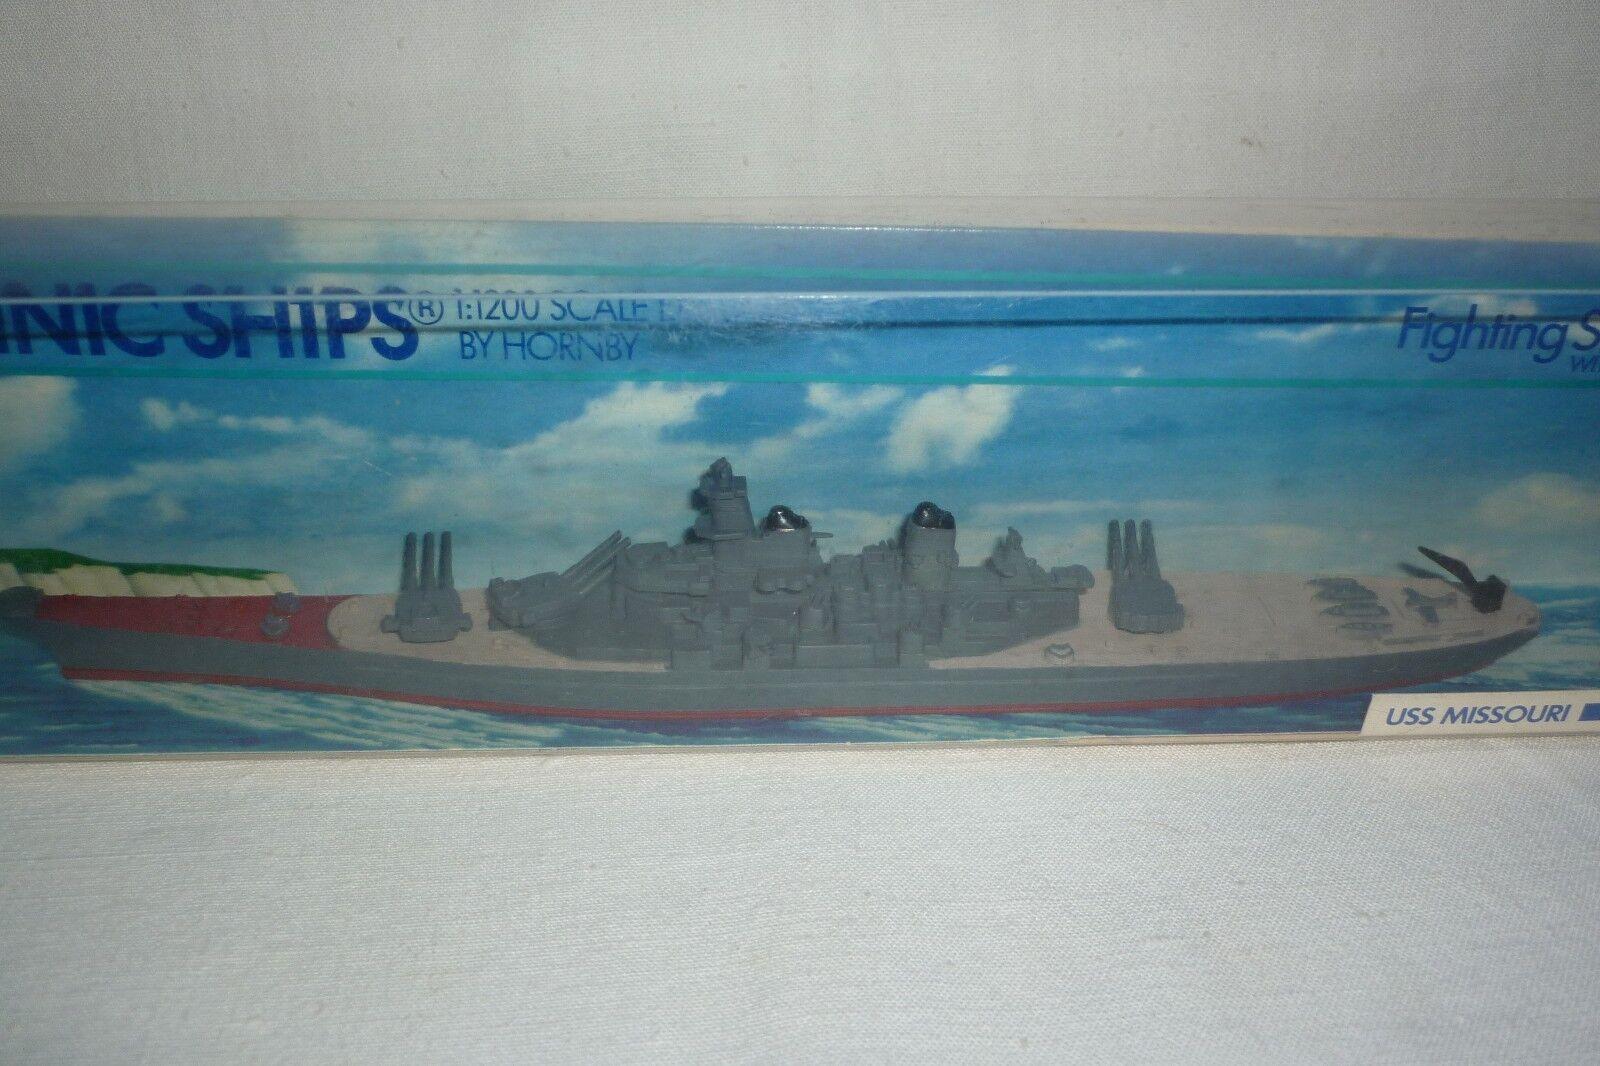 MINIC SHIPS - DIECAST BY HORNBY - - - USS MISSOURI - 1 1200 - OVP - (1.BO-5) 449d82